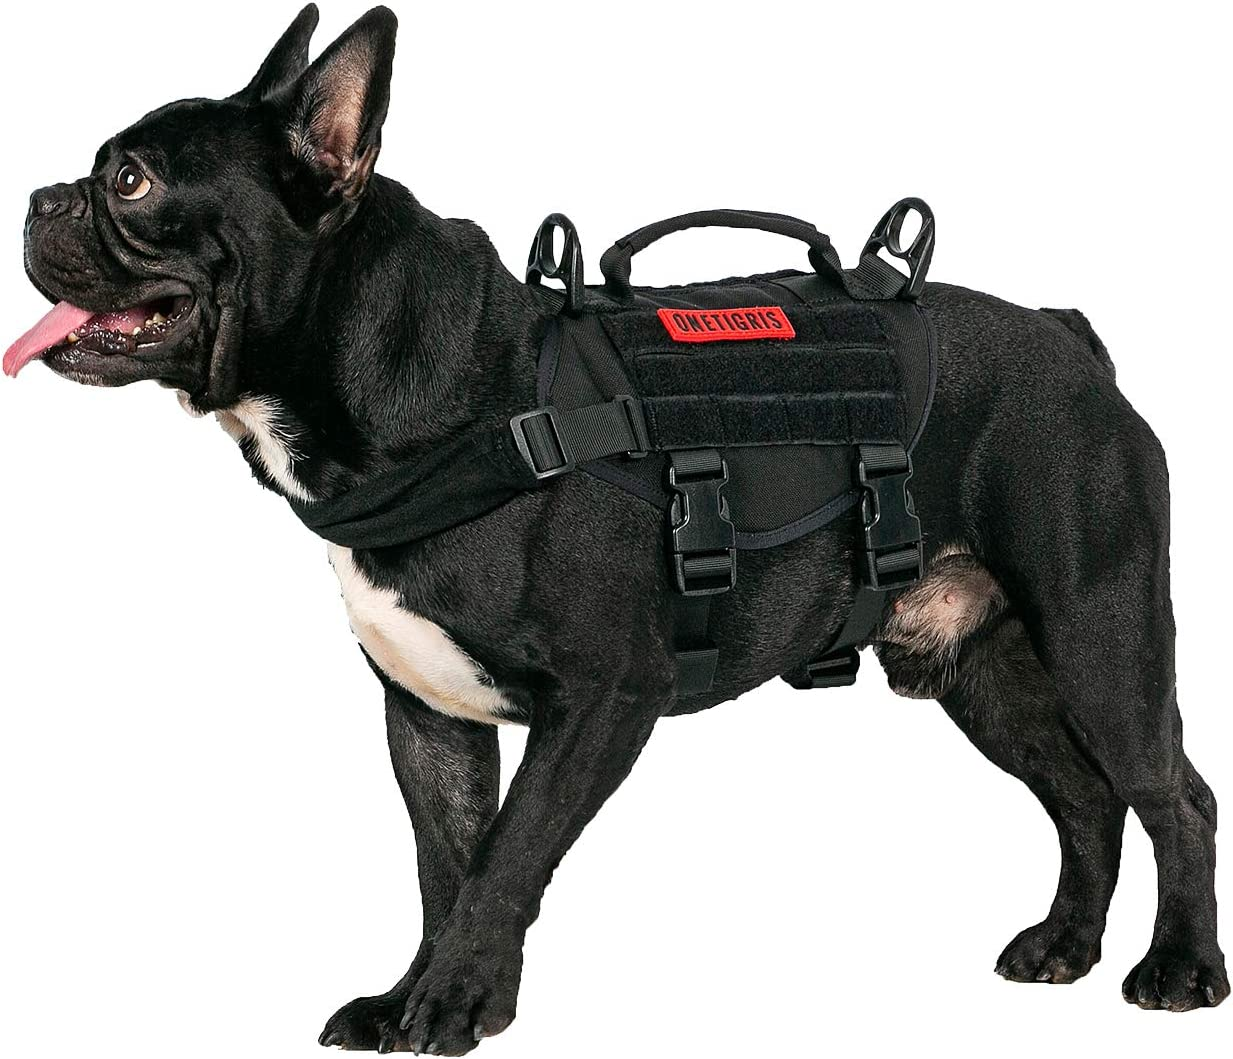 OneTigris Chaleco para perro pequeño, arnés táctico para perro con mango vertical duradero para cachorro pequeño: Amazon.es: Productos para mascotas